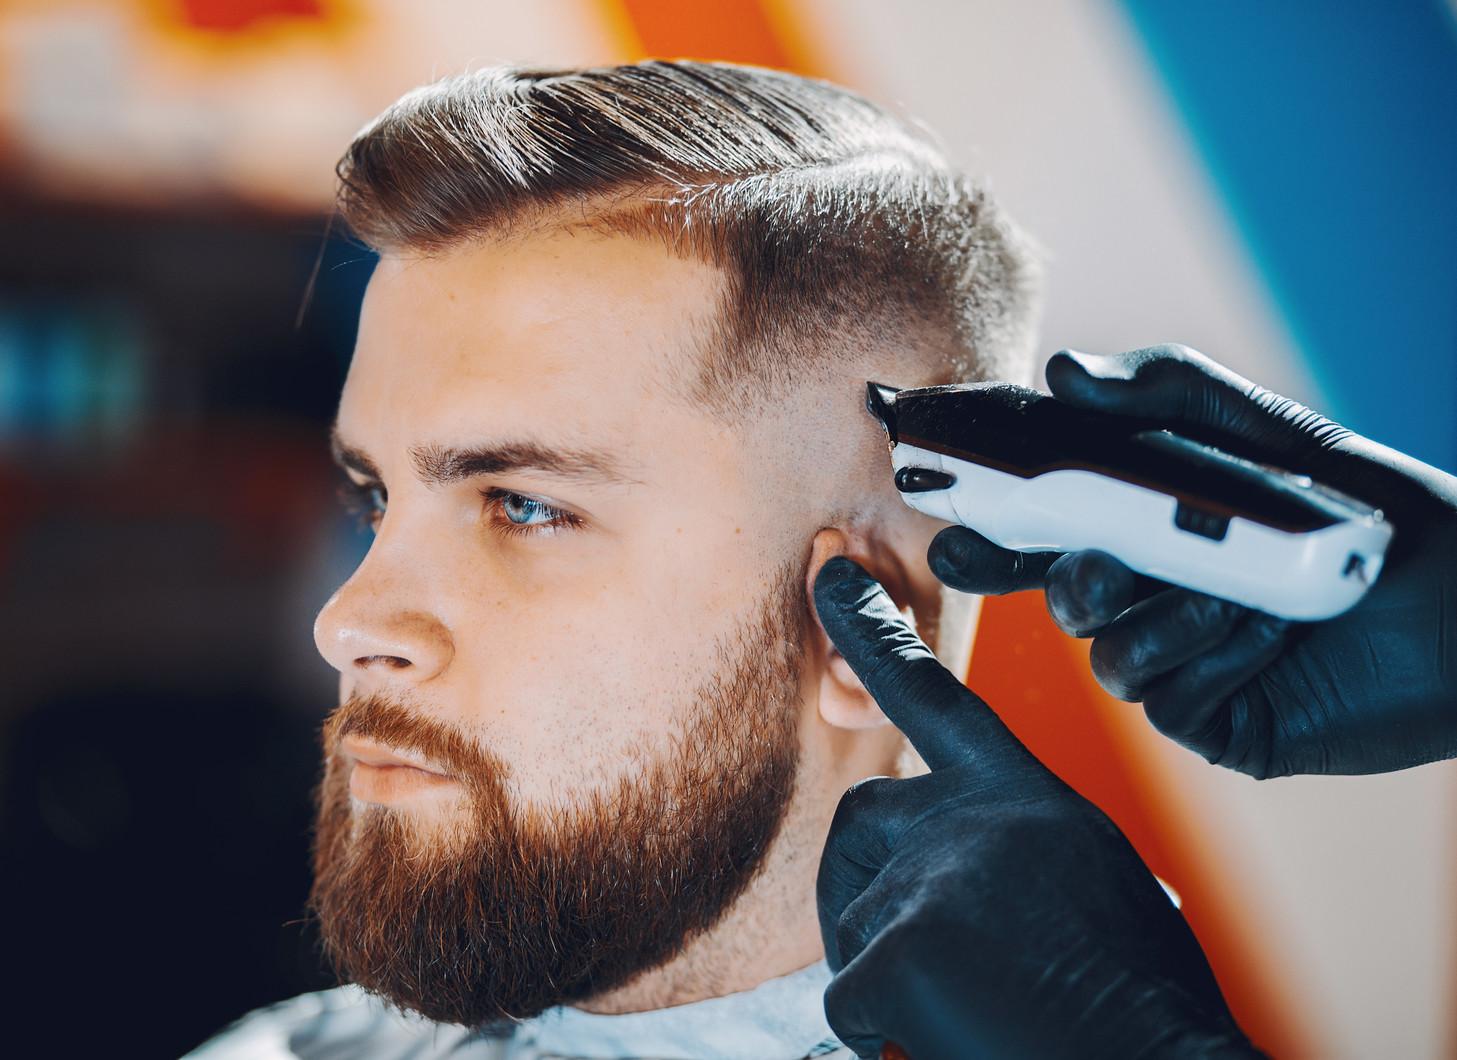 stylish-man-sitting-barbershop.jpg